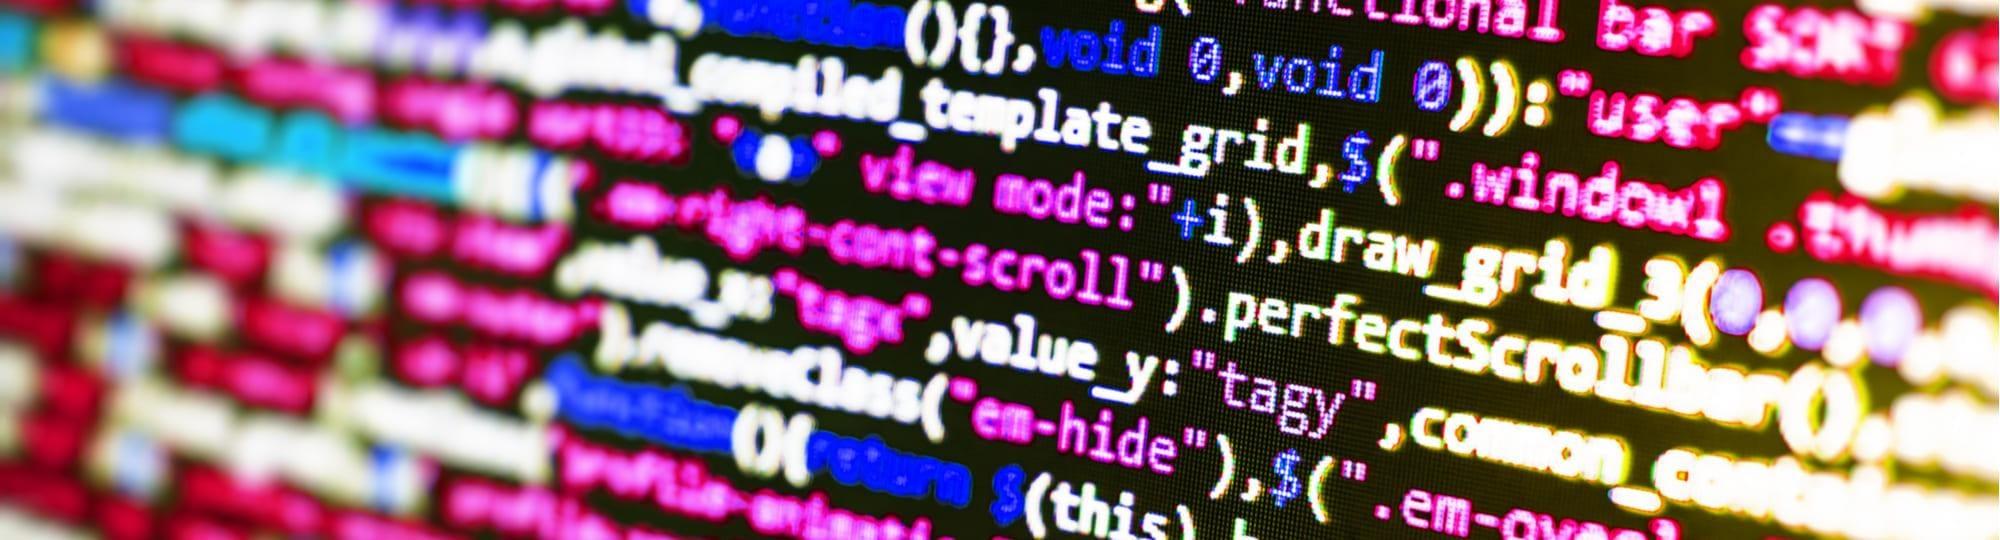 Backend Web Development Frameworks